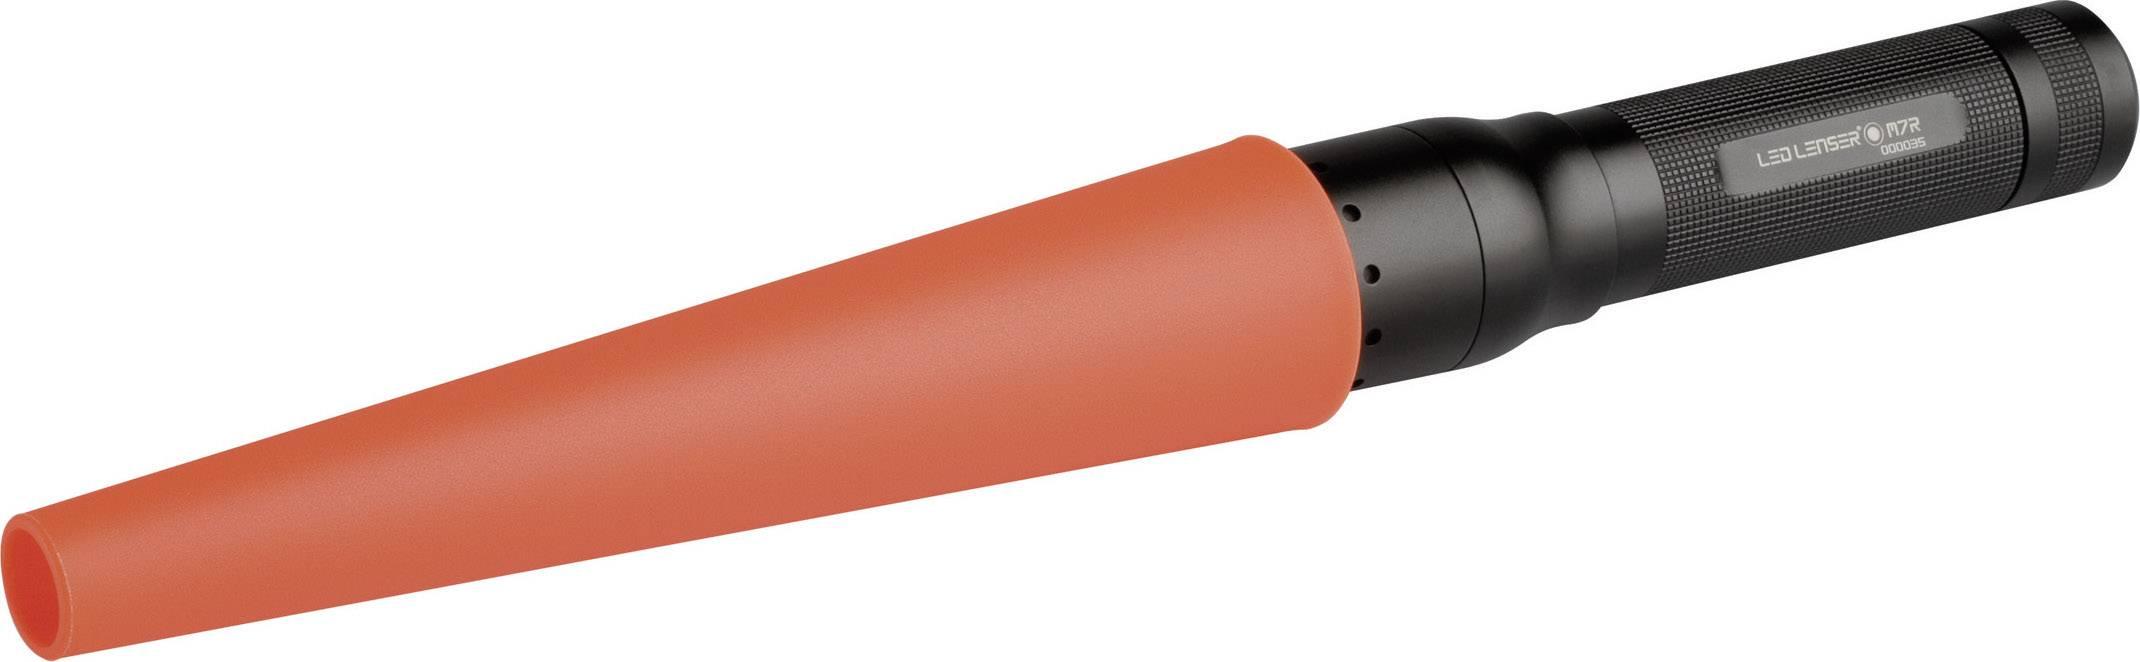 Nástavec signálneho svetla pre LED Lenser P7, M7, B7, T7, MT7, M7R